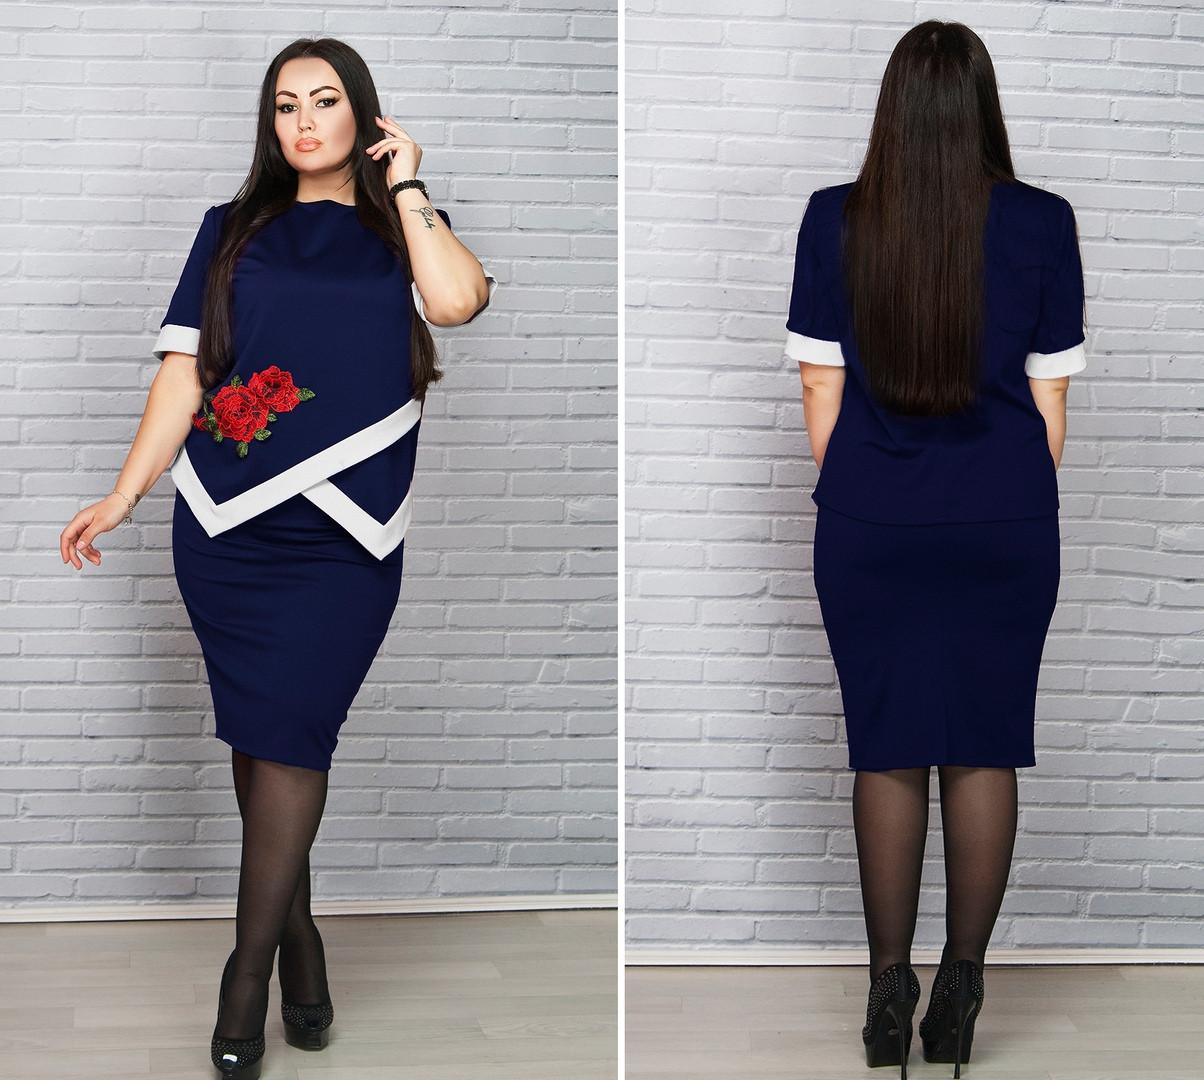 86e68d7d96b Костюм женский кофточка и юбка супер батал в расцветках 26926 ...